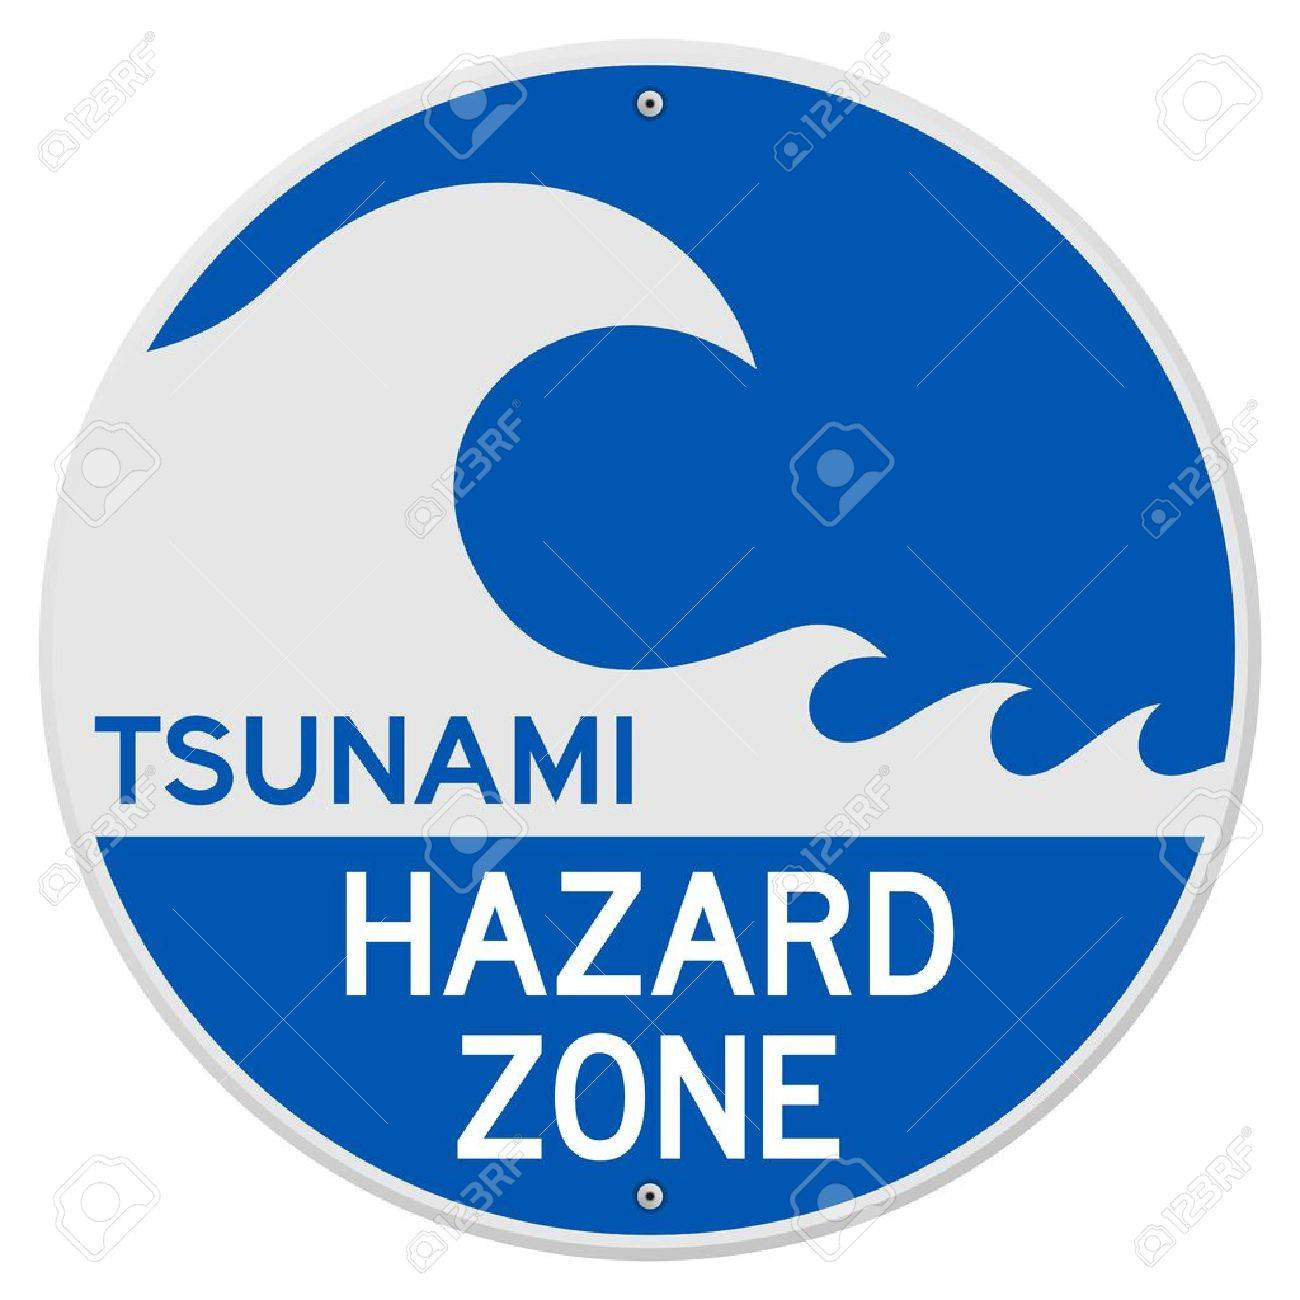 Tsunami Hazard Zone - 13584584